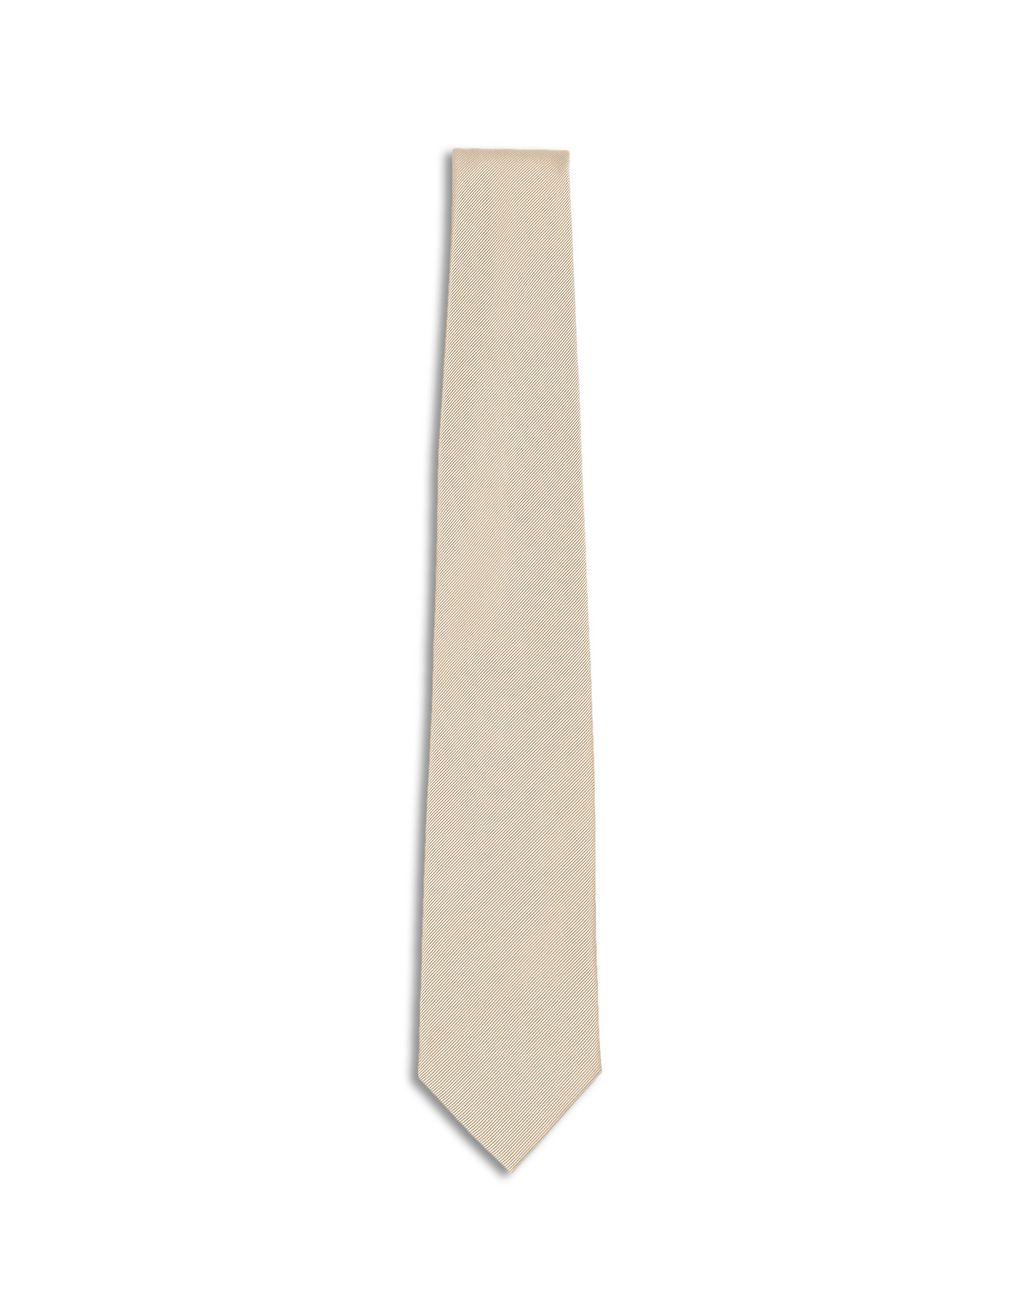 BRIONI Champagnerfarbene Twillkrawatte Krawatte Herren f